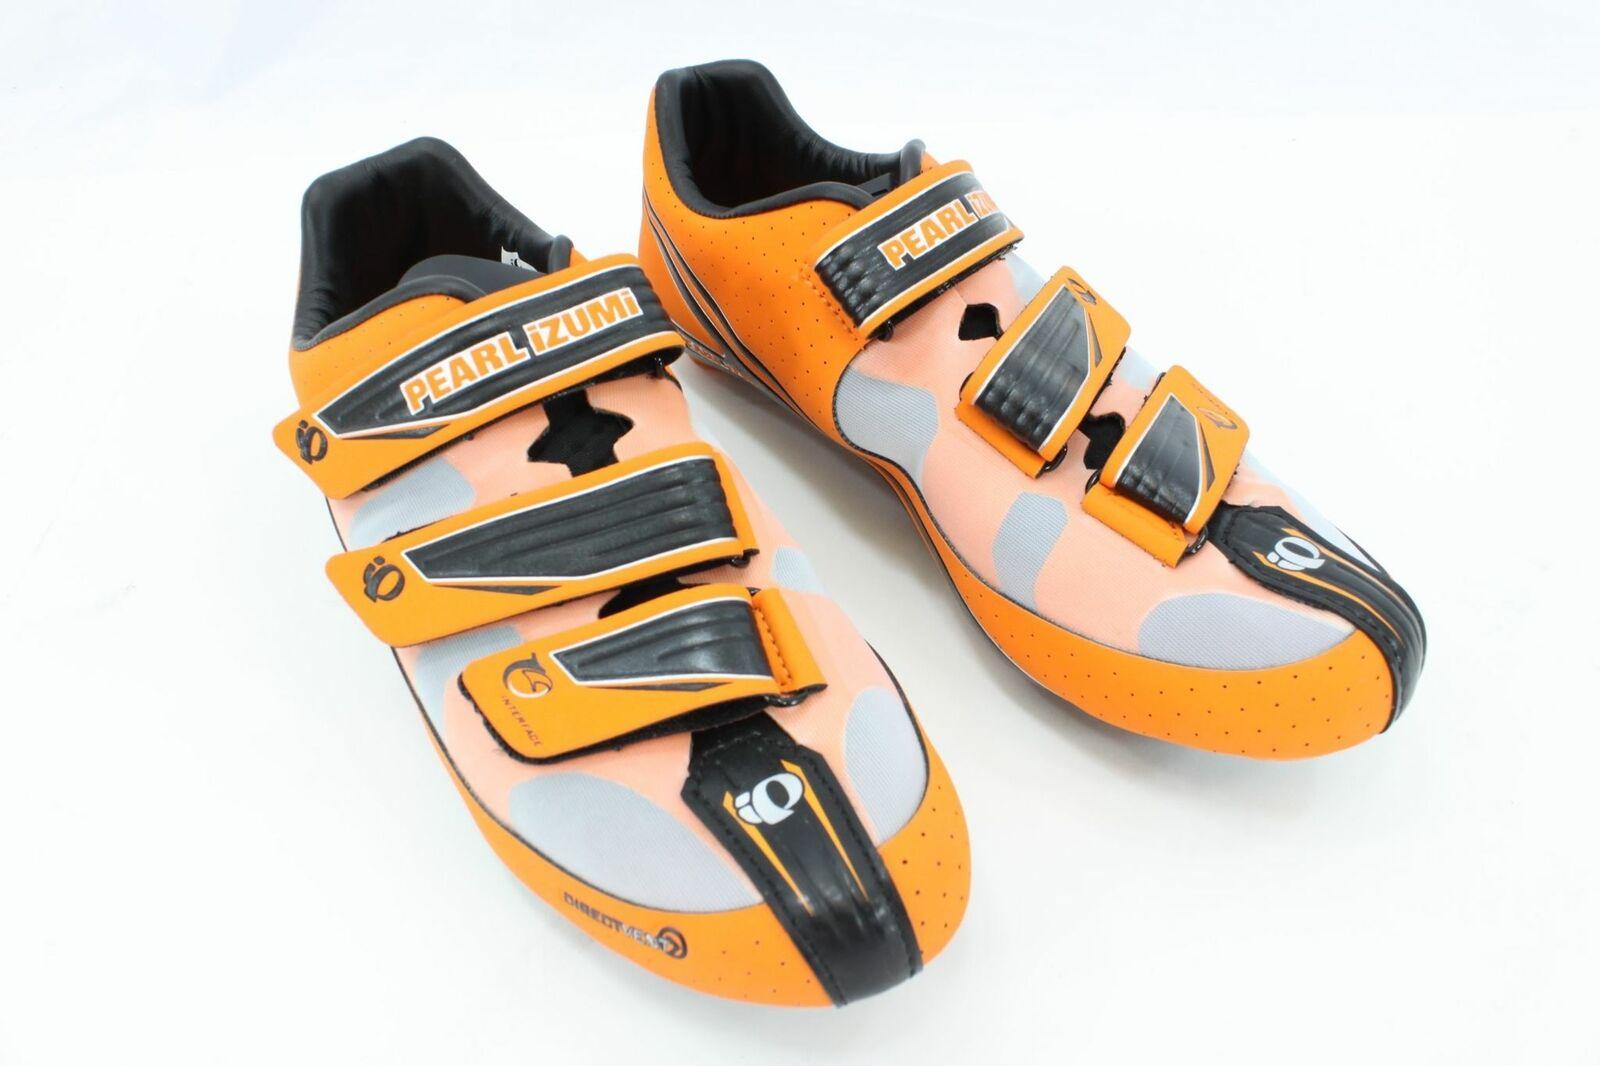 Pearl iZumi Octane SL 111 RD Men's Cycling shoes